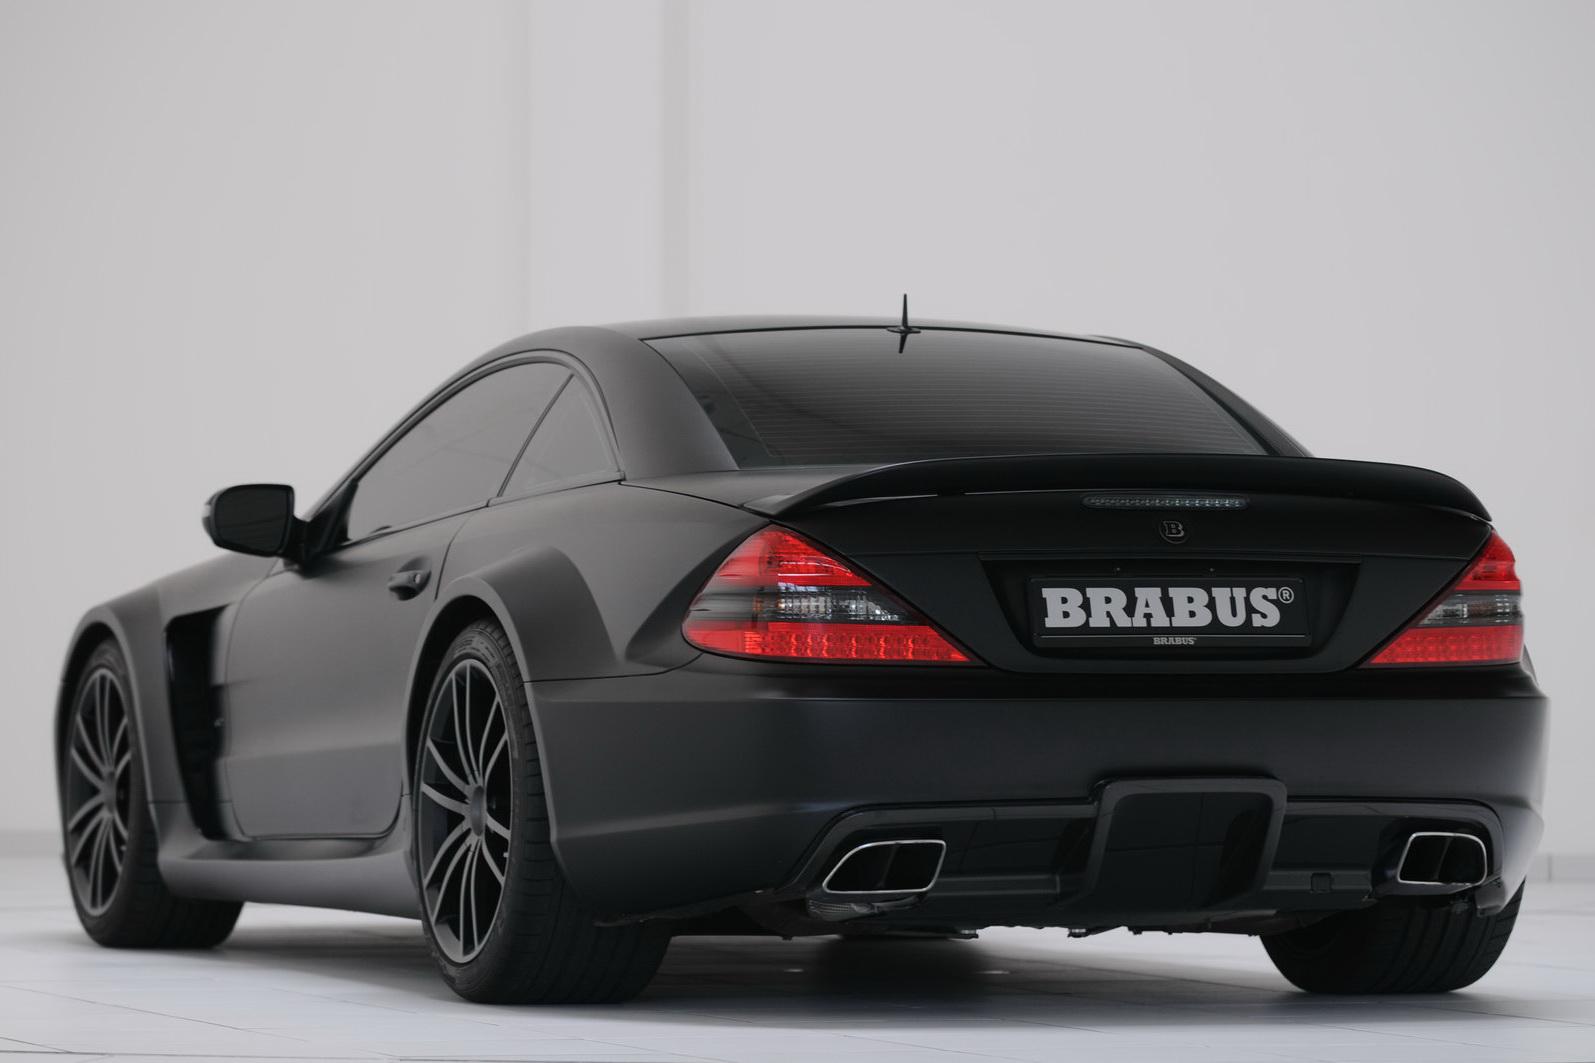 http://4.bp.blogspot.com/_FoXyvaPSnVk/S-2edfdf7kI/AAAAAAAC2Z4/Ymupf0ZOIfE/s1600/Brabus-Mercedes-SL-65-Black-12.JPG